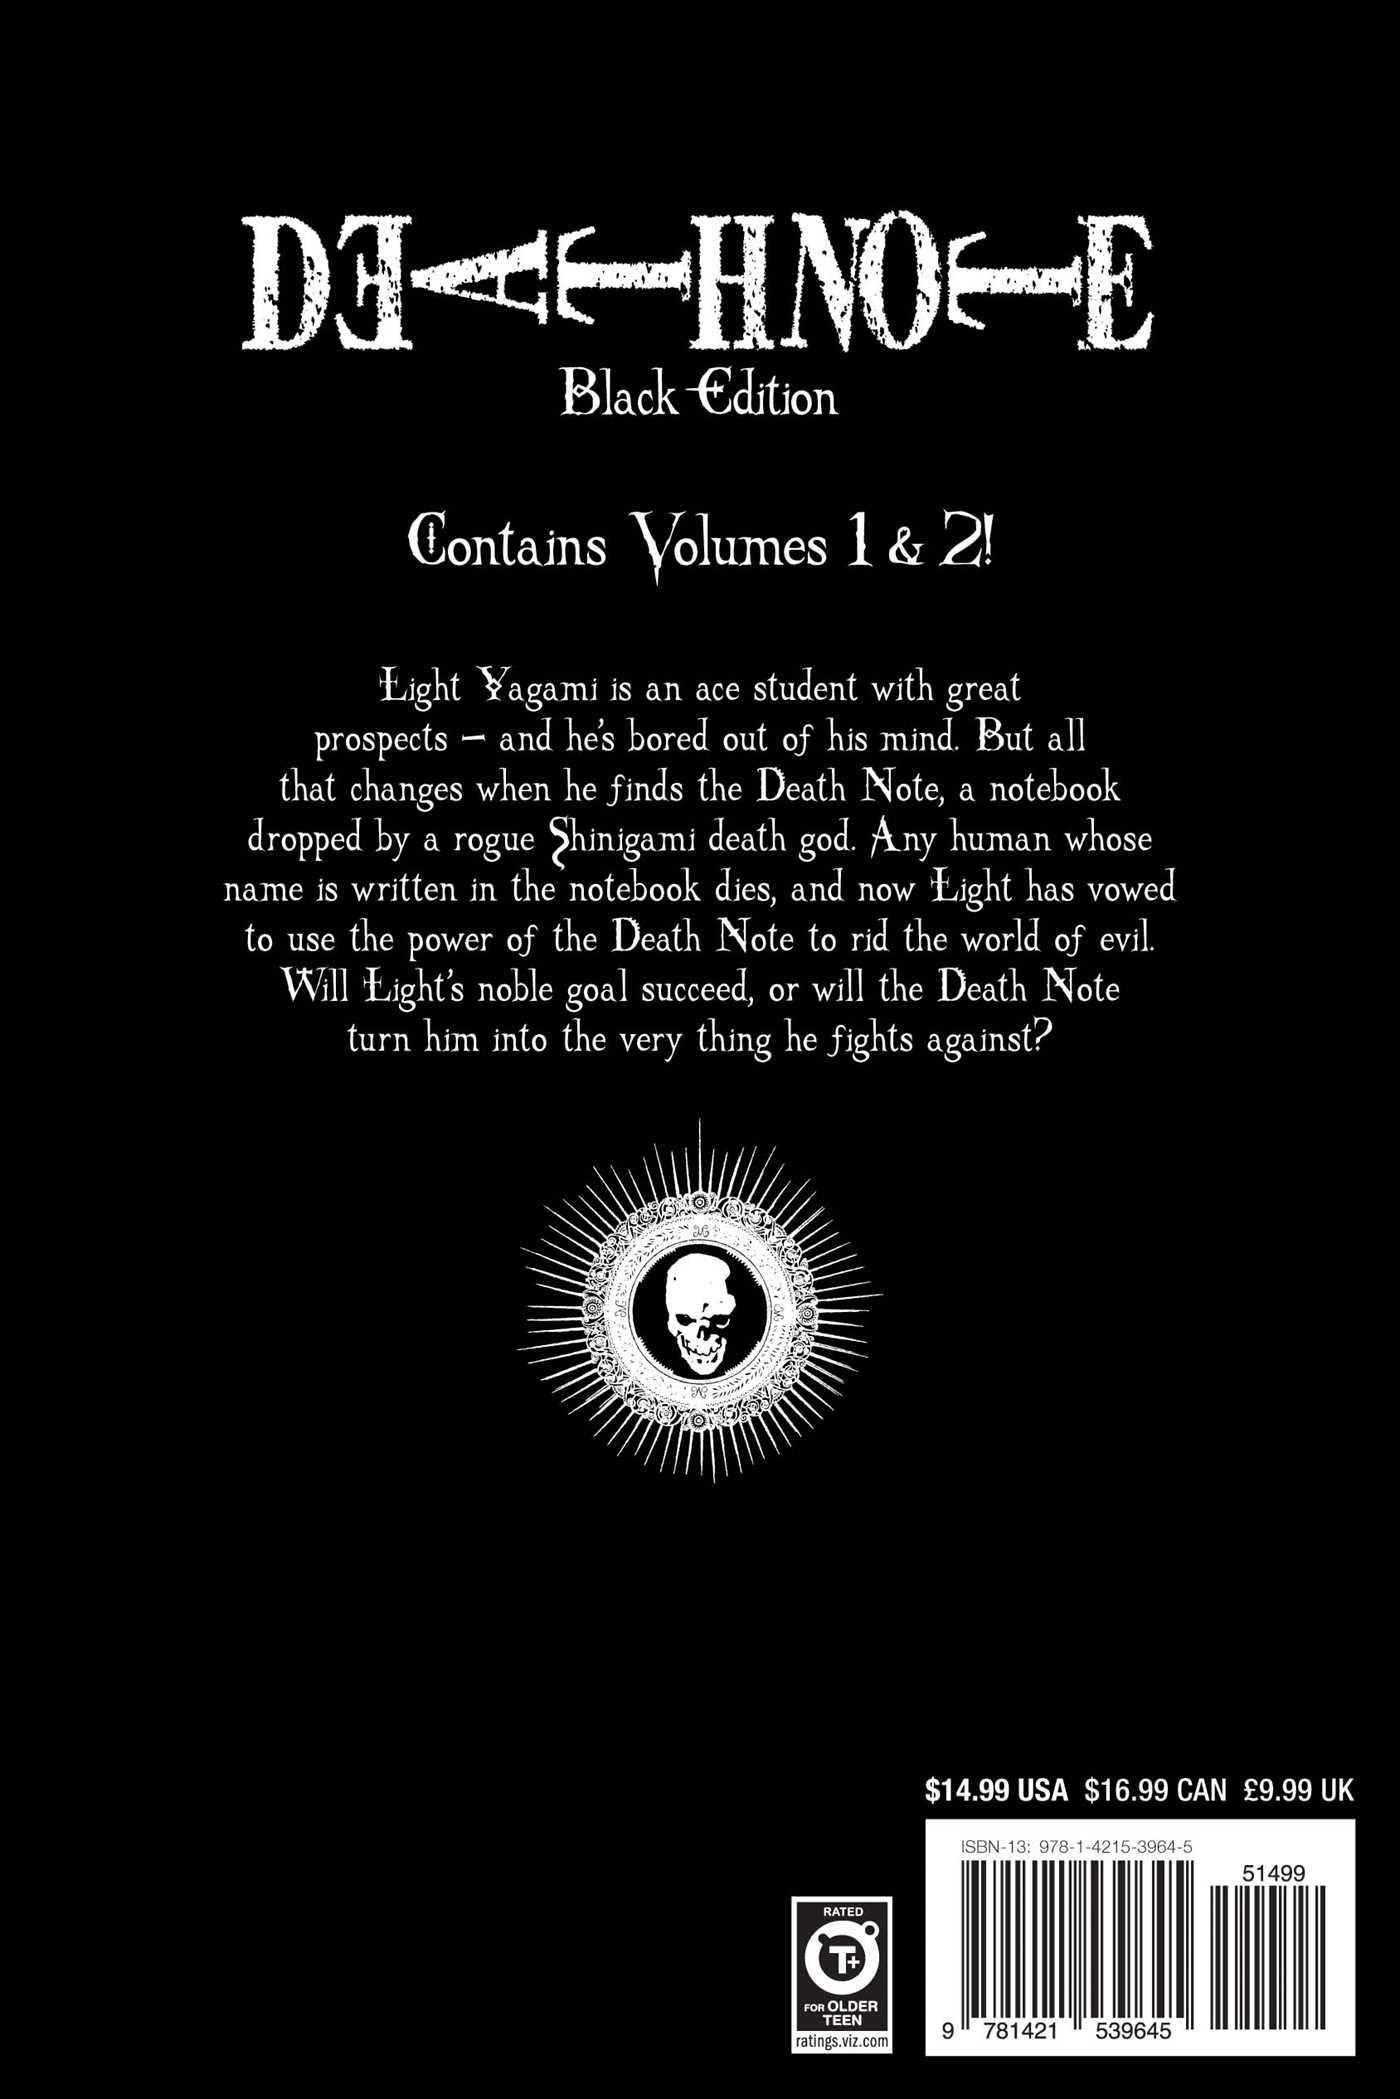 Death Note Black Edition Vol 1 Tsugumi Ohba Takeshi Obata – Death Note